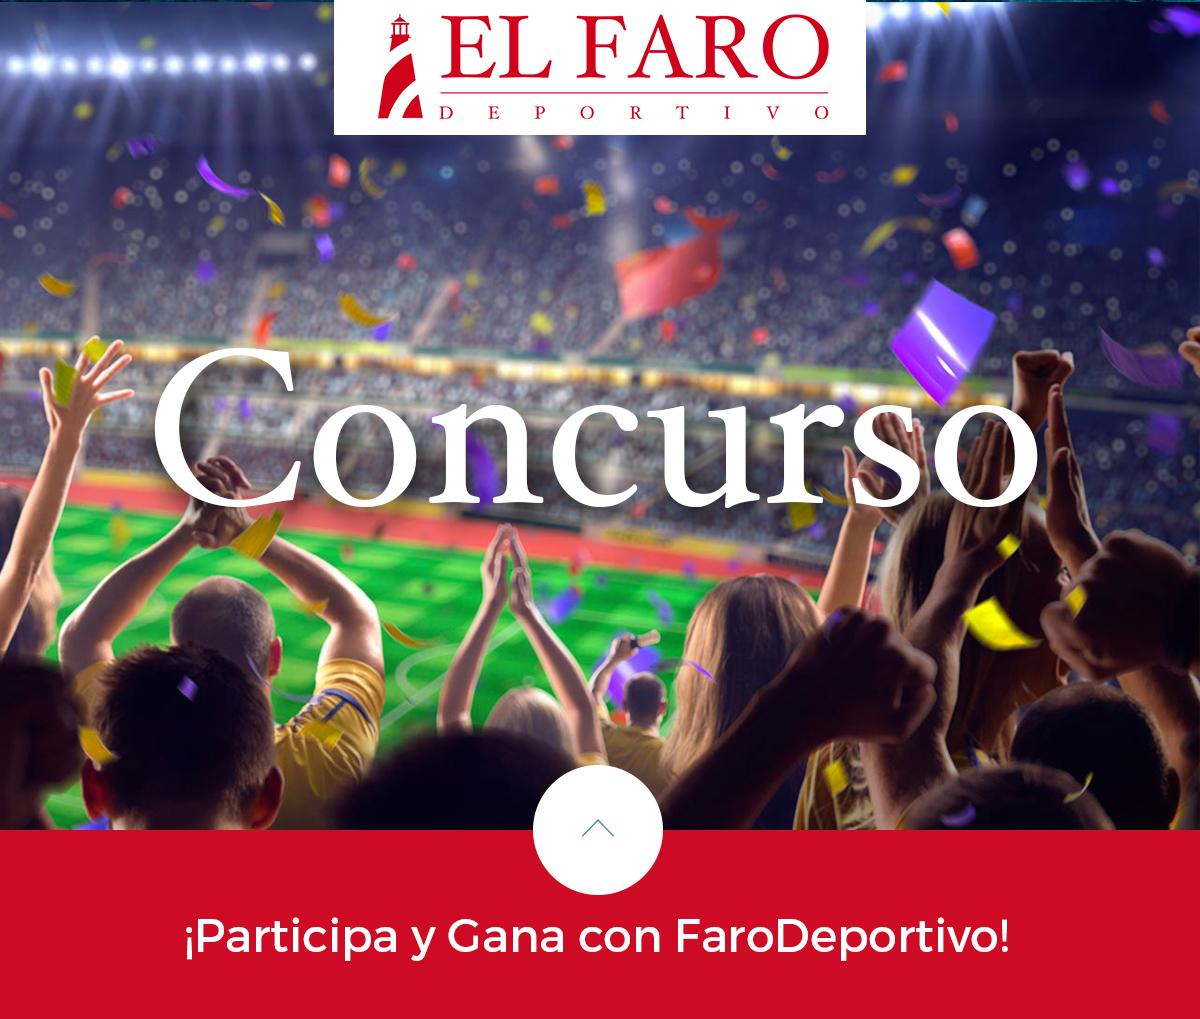 Faro instagram